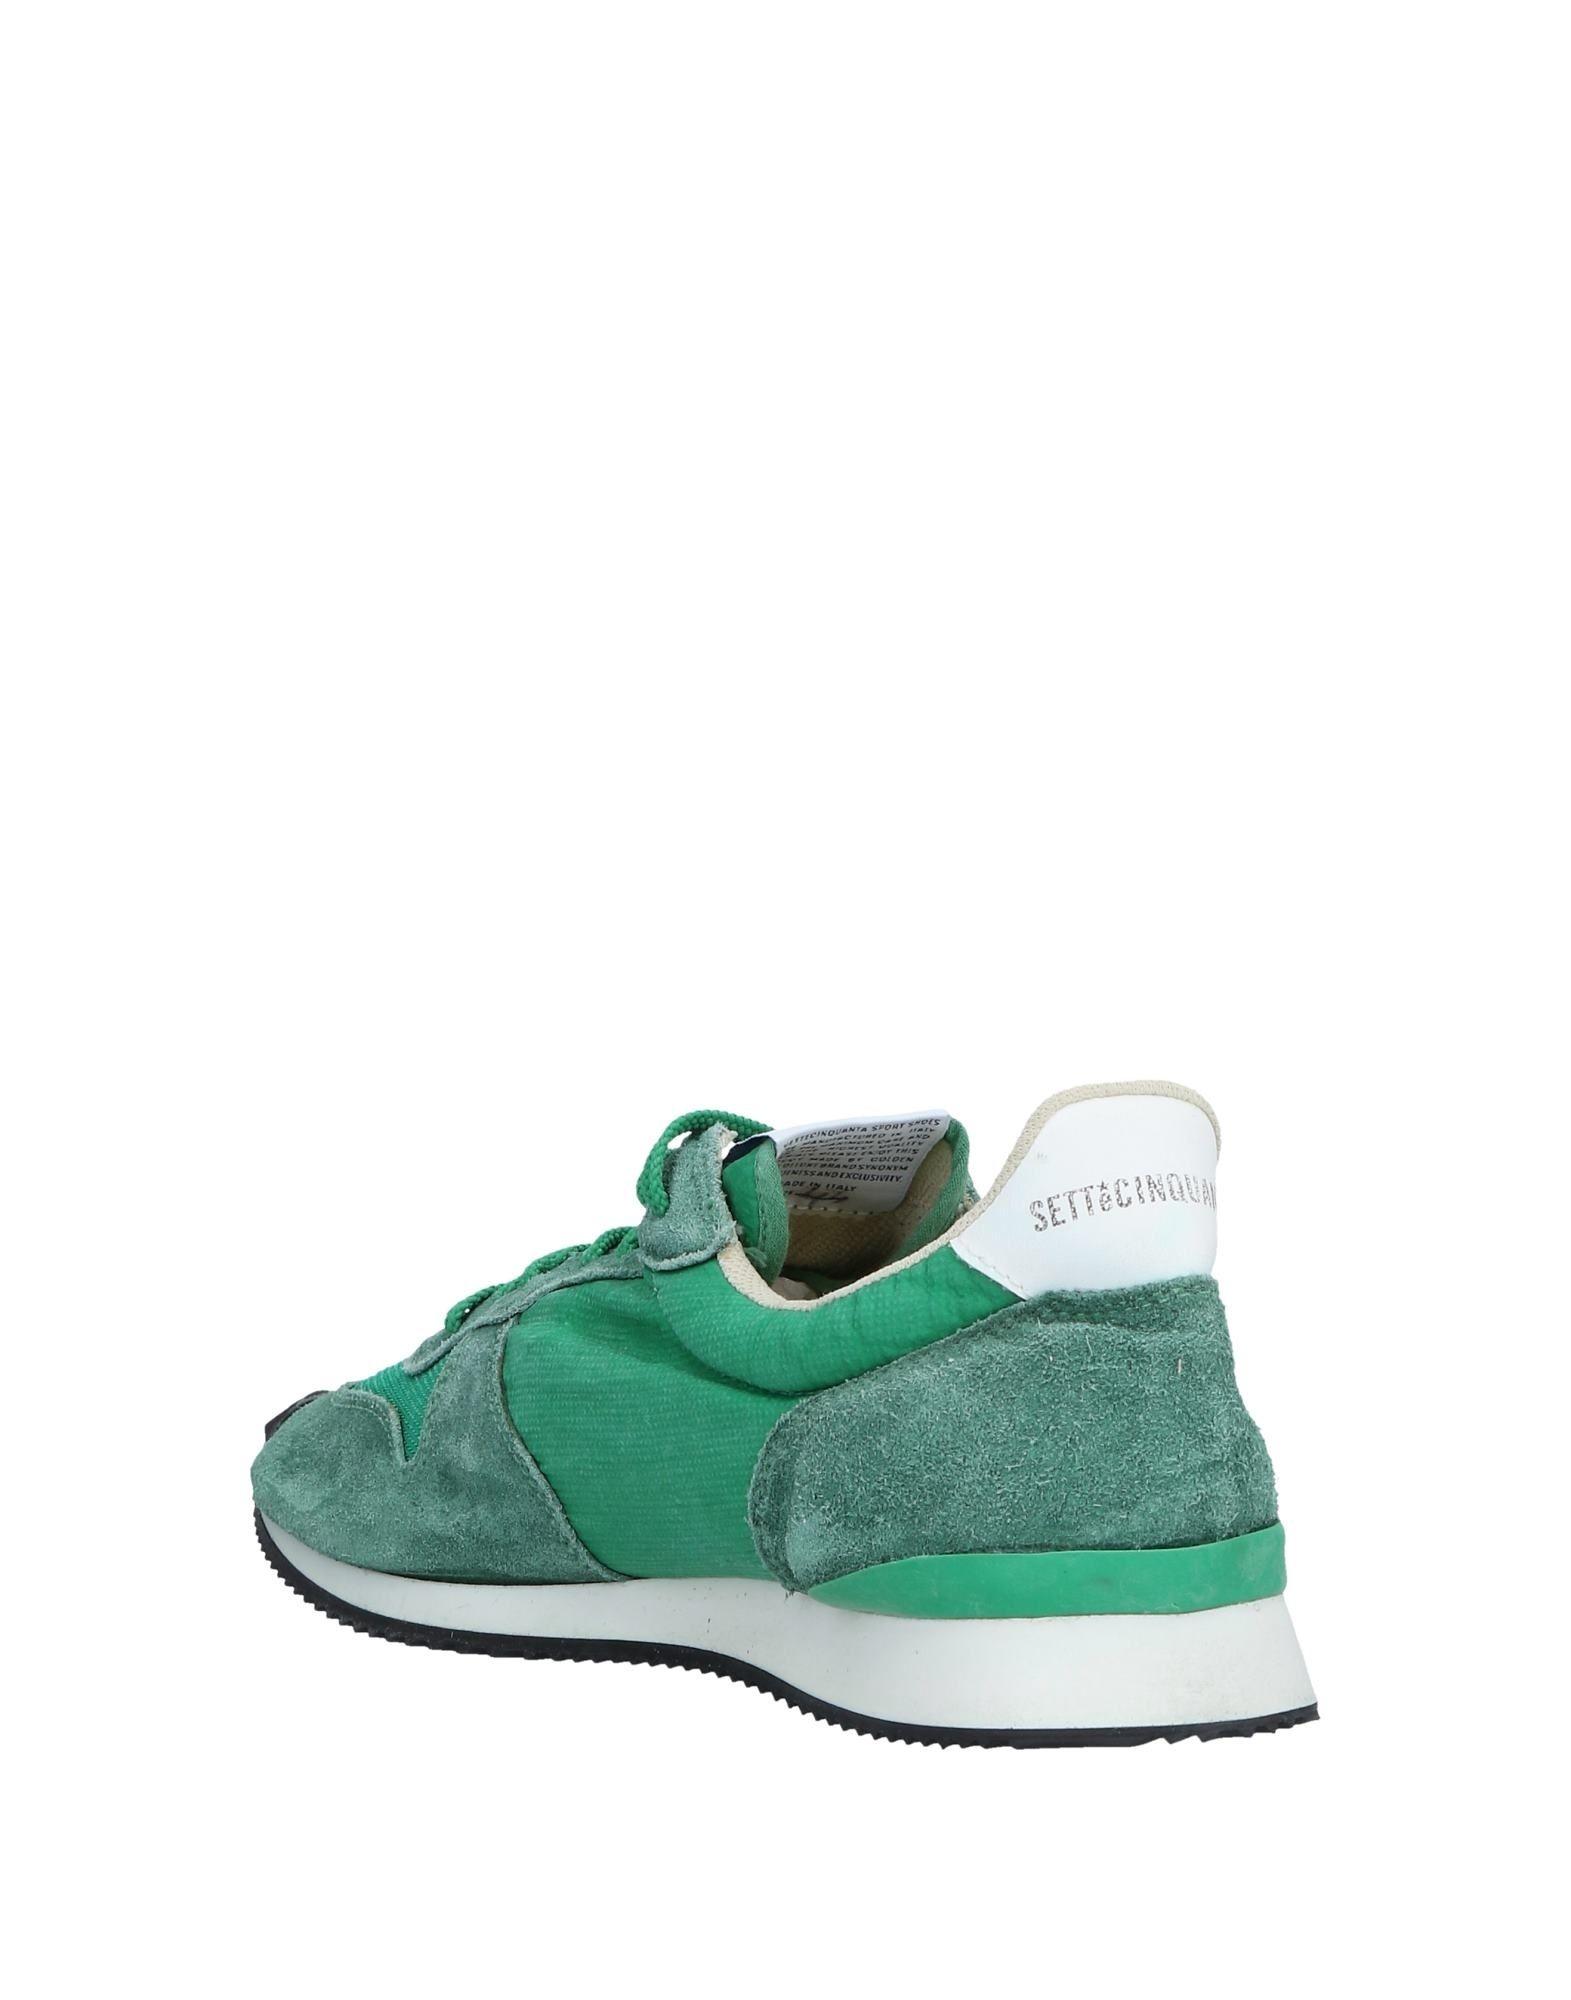 11534972JQ G750g Sneakers Herren  11534972JQ  06ccac